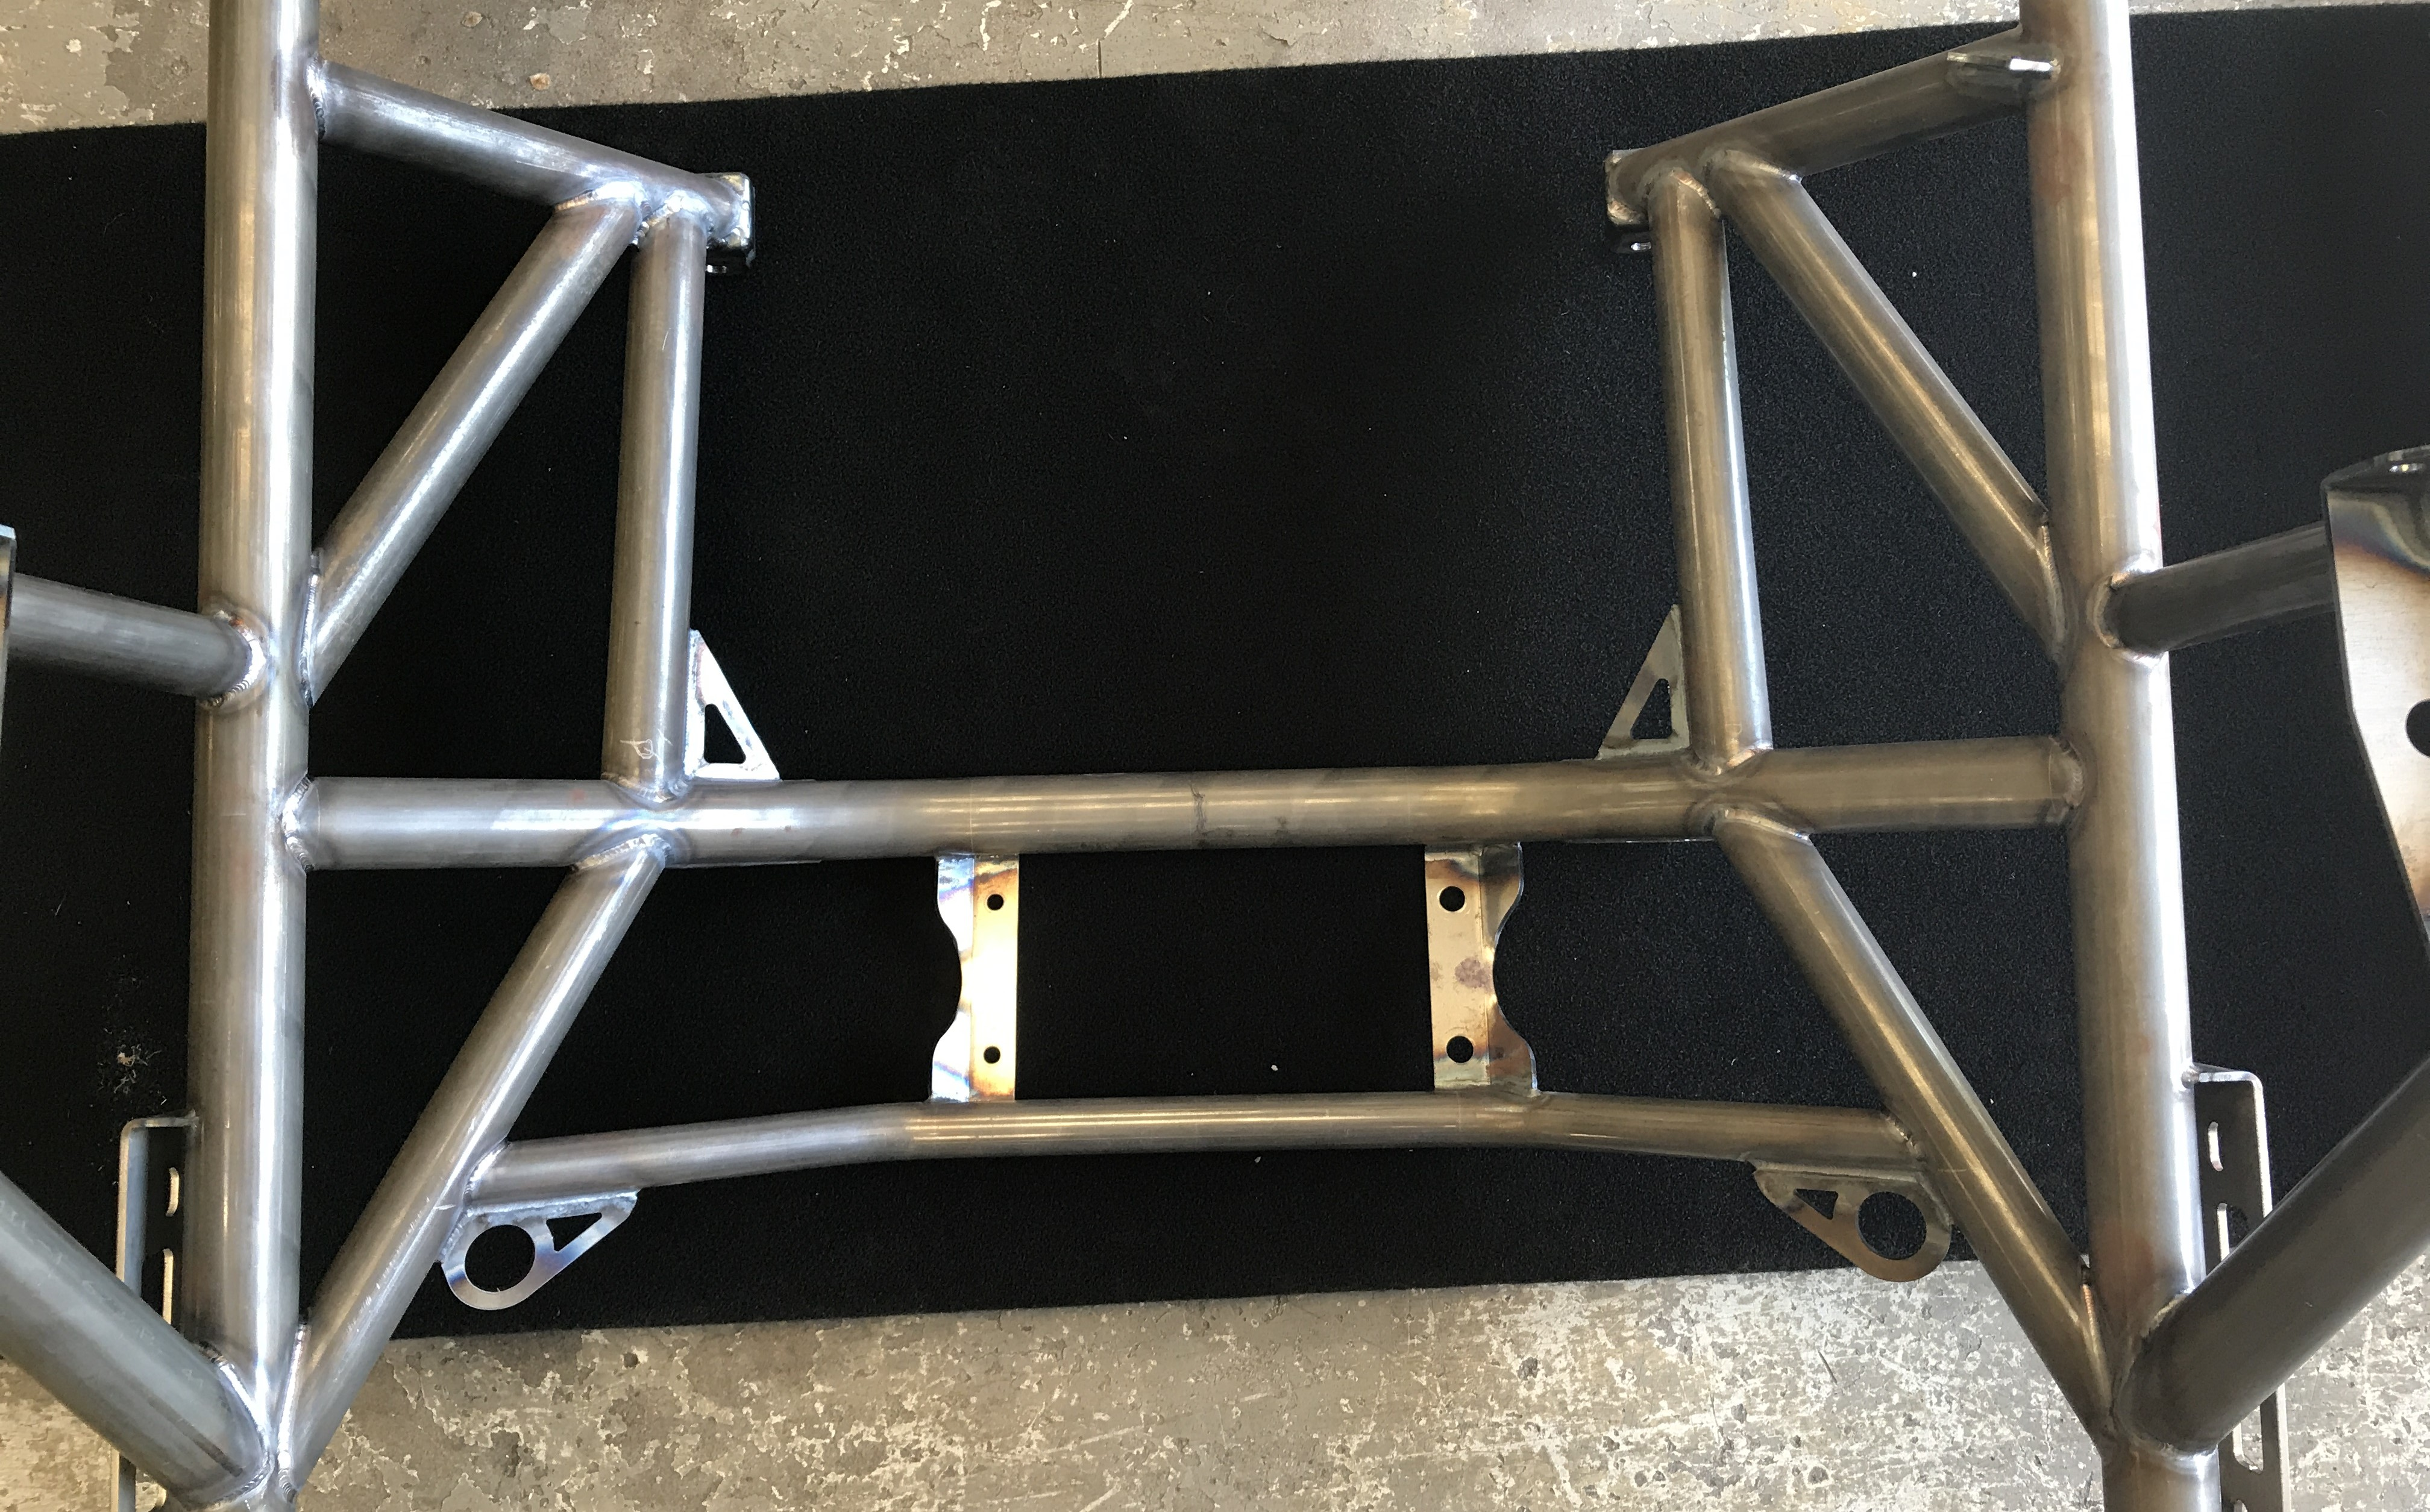 62-67 Chevy II Nova Frame